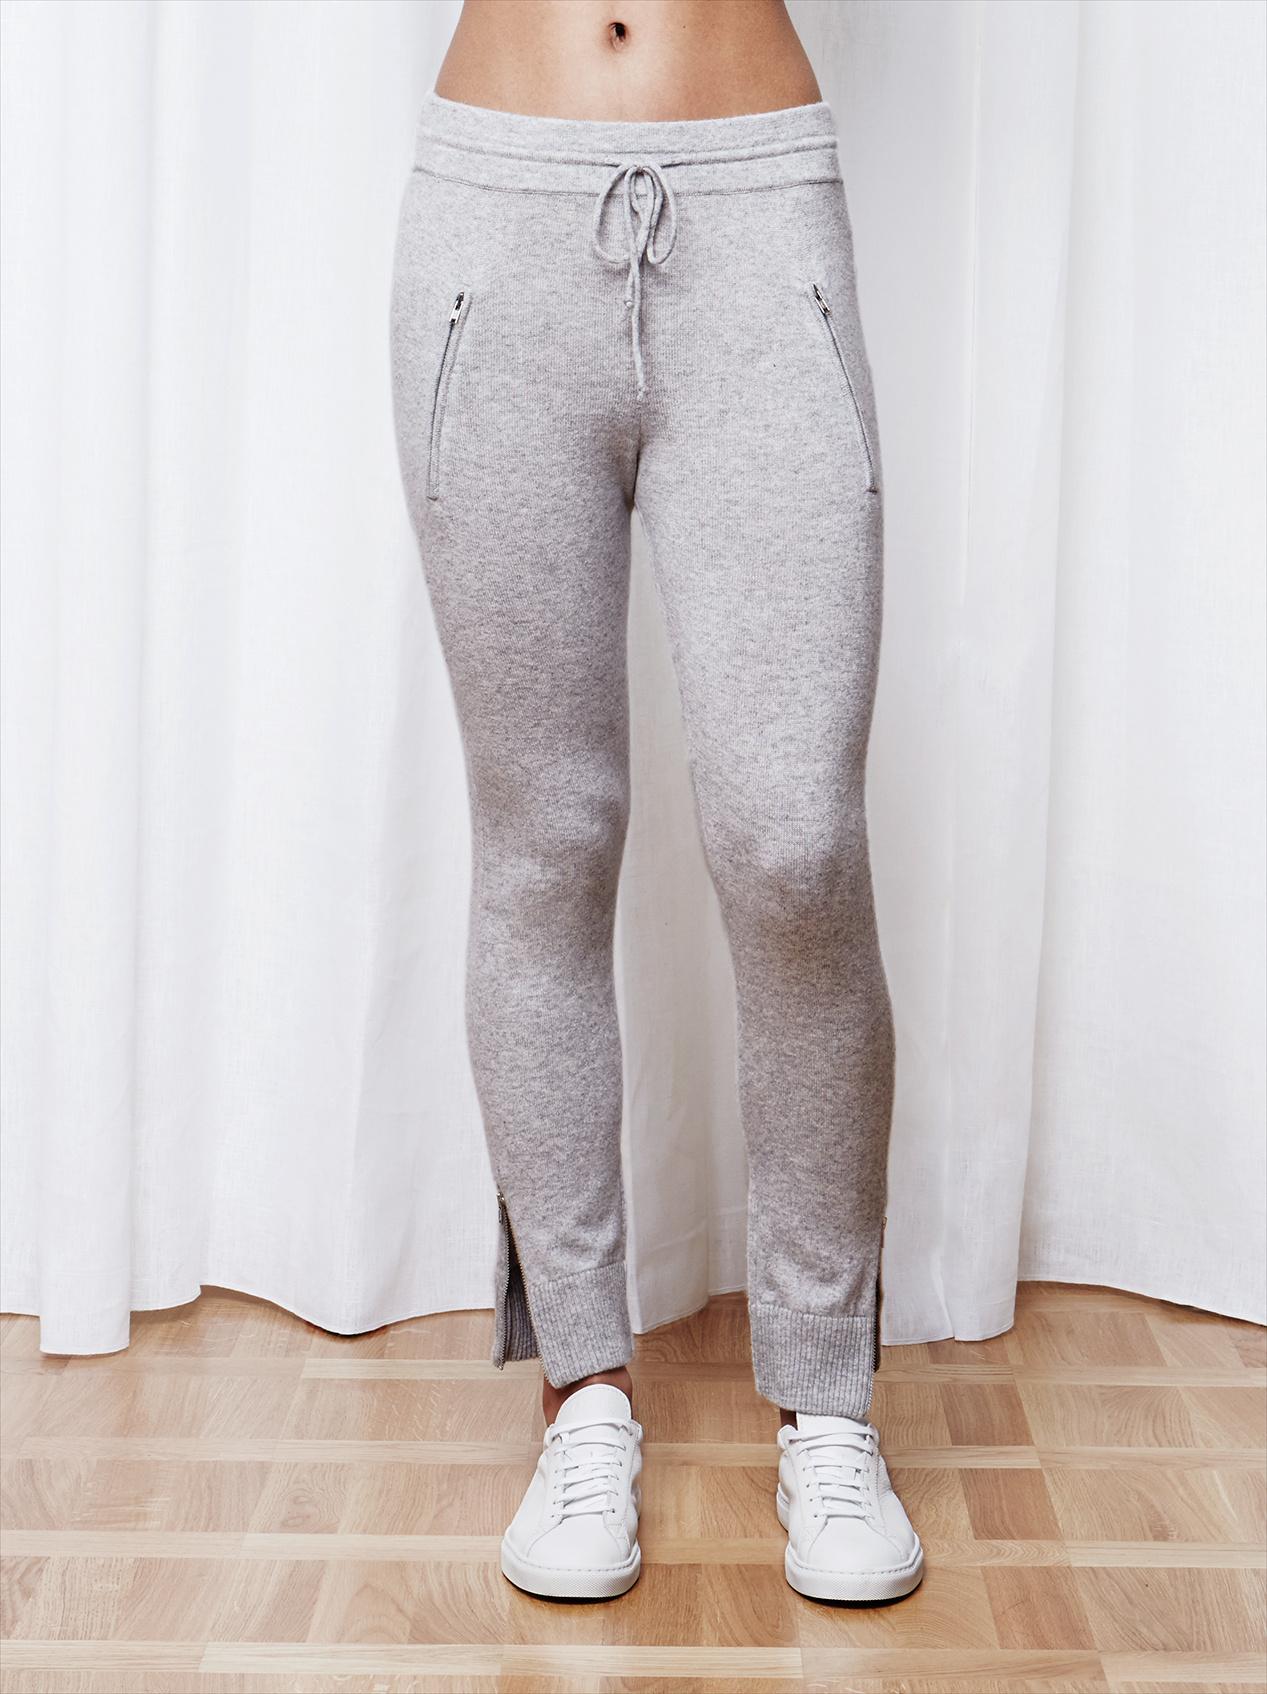 Soft Goat Women's Zipper Pants Ljusgrå